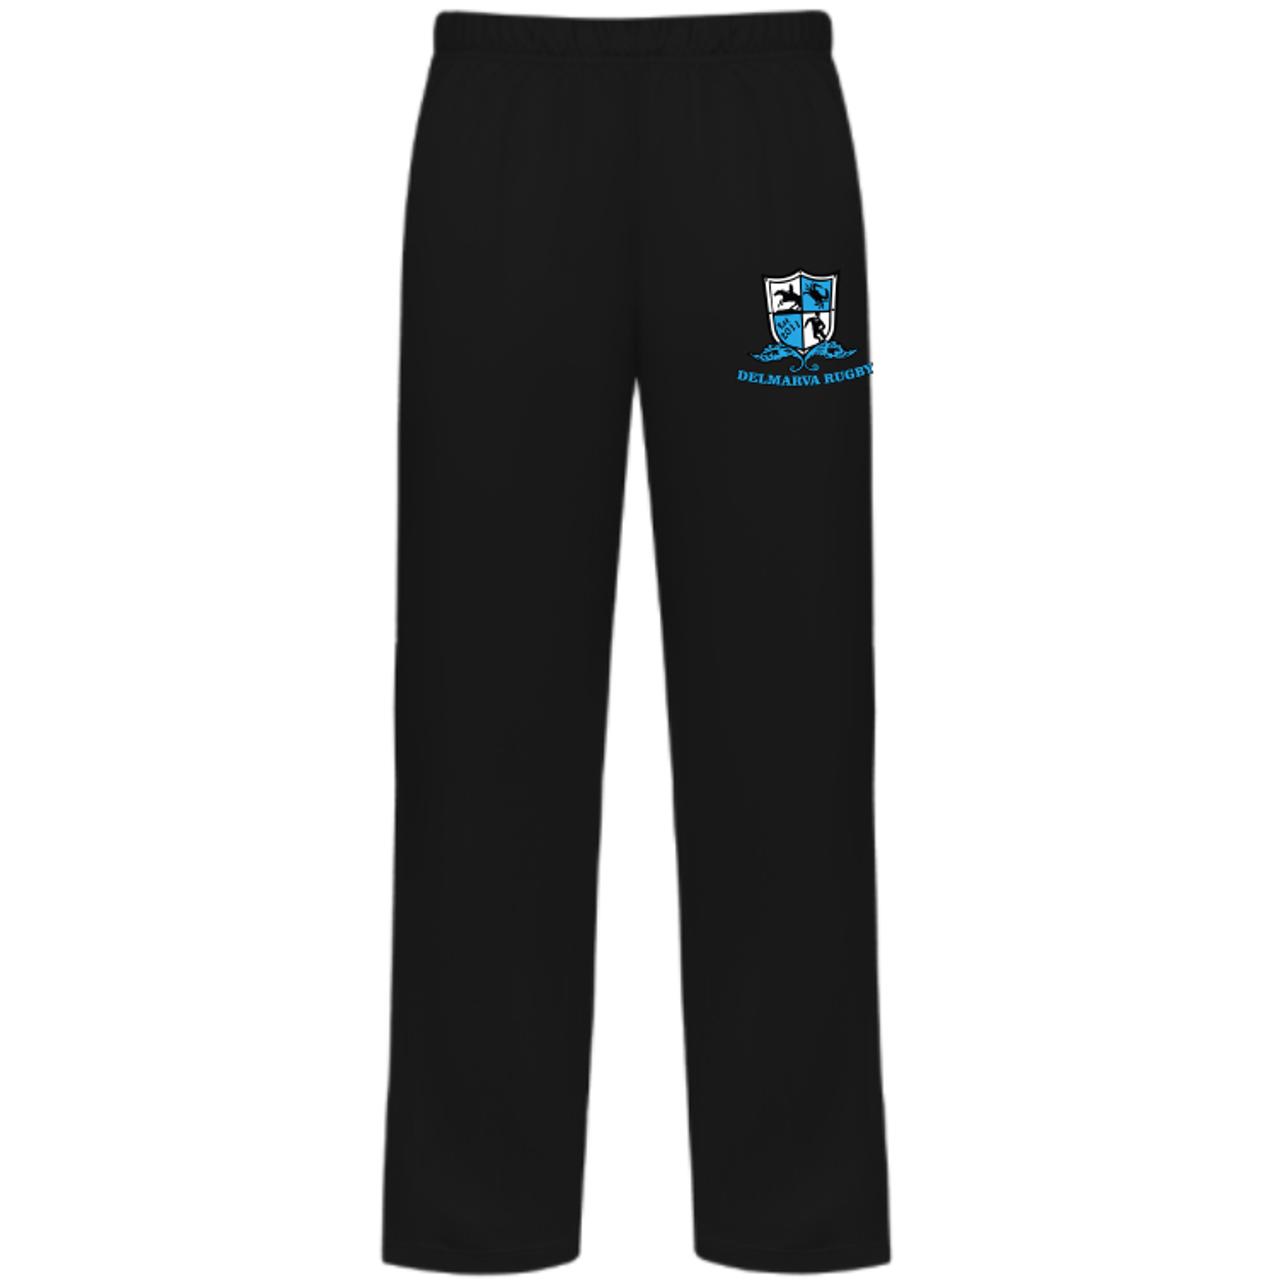 Delmarva Performance Fleece Pants, Black